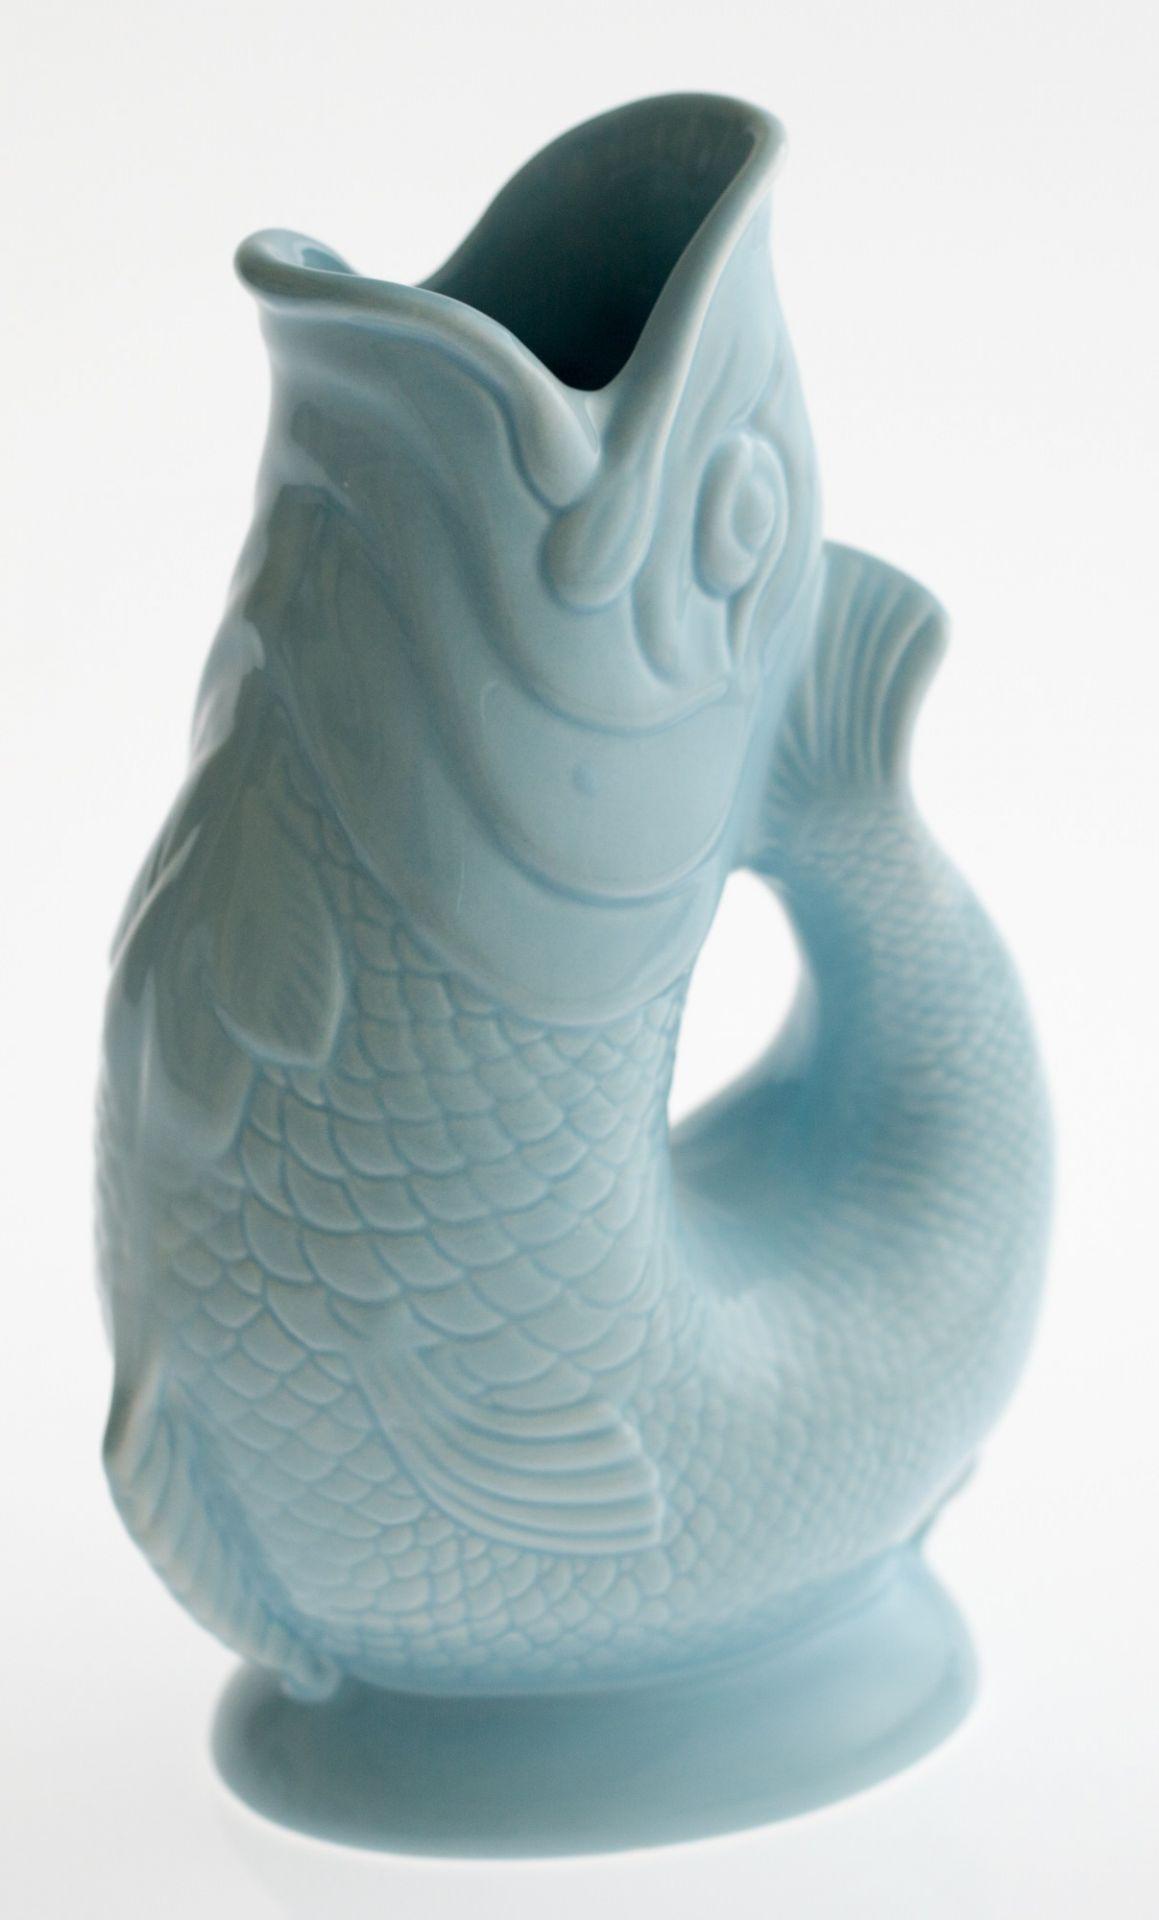 Gluckigluck carafe / vase